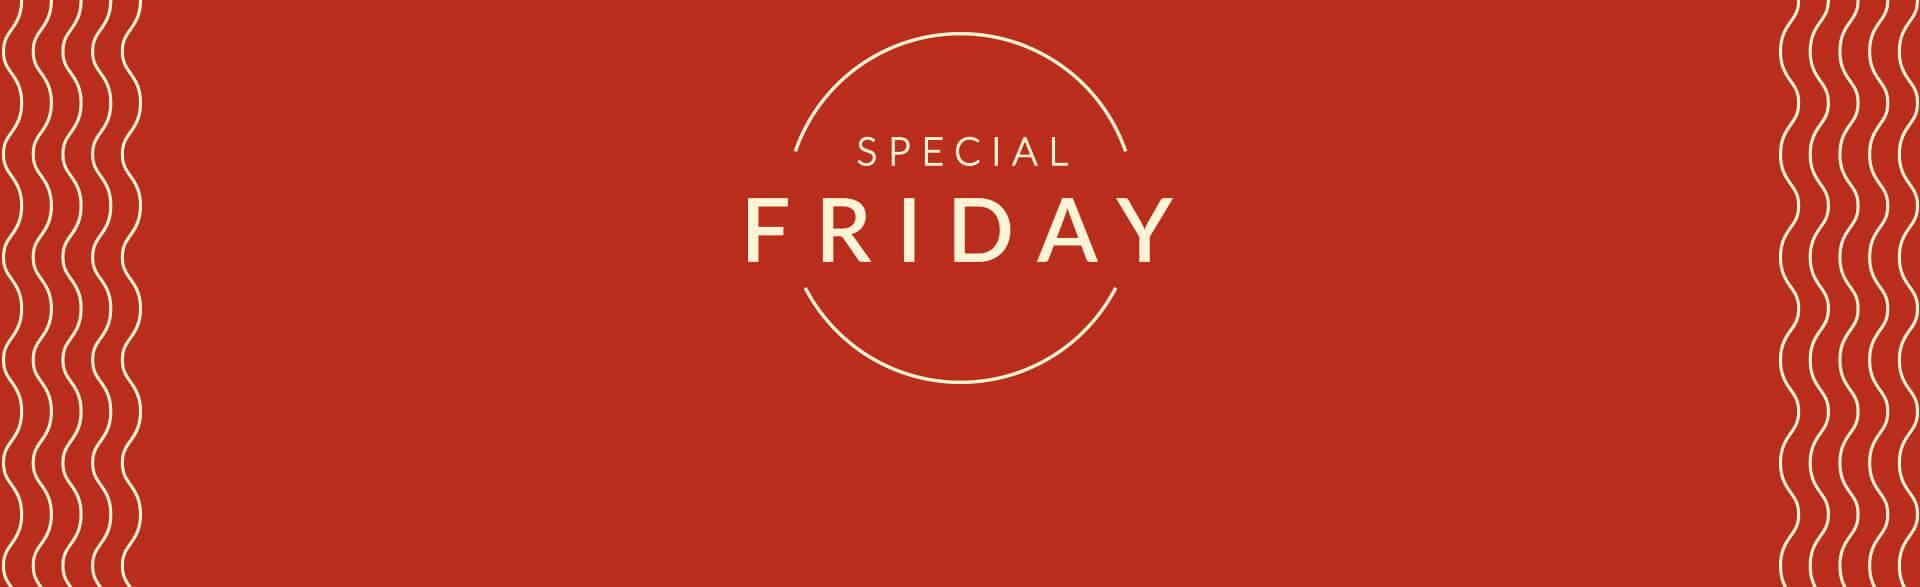 Special Friday